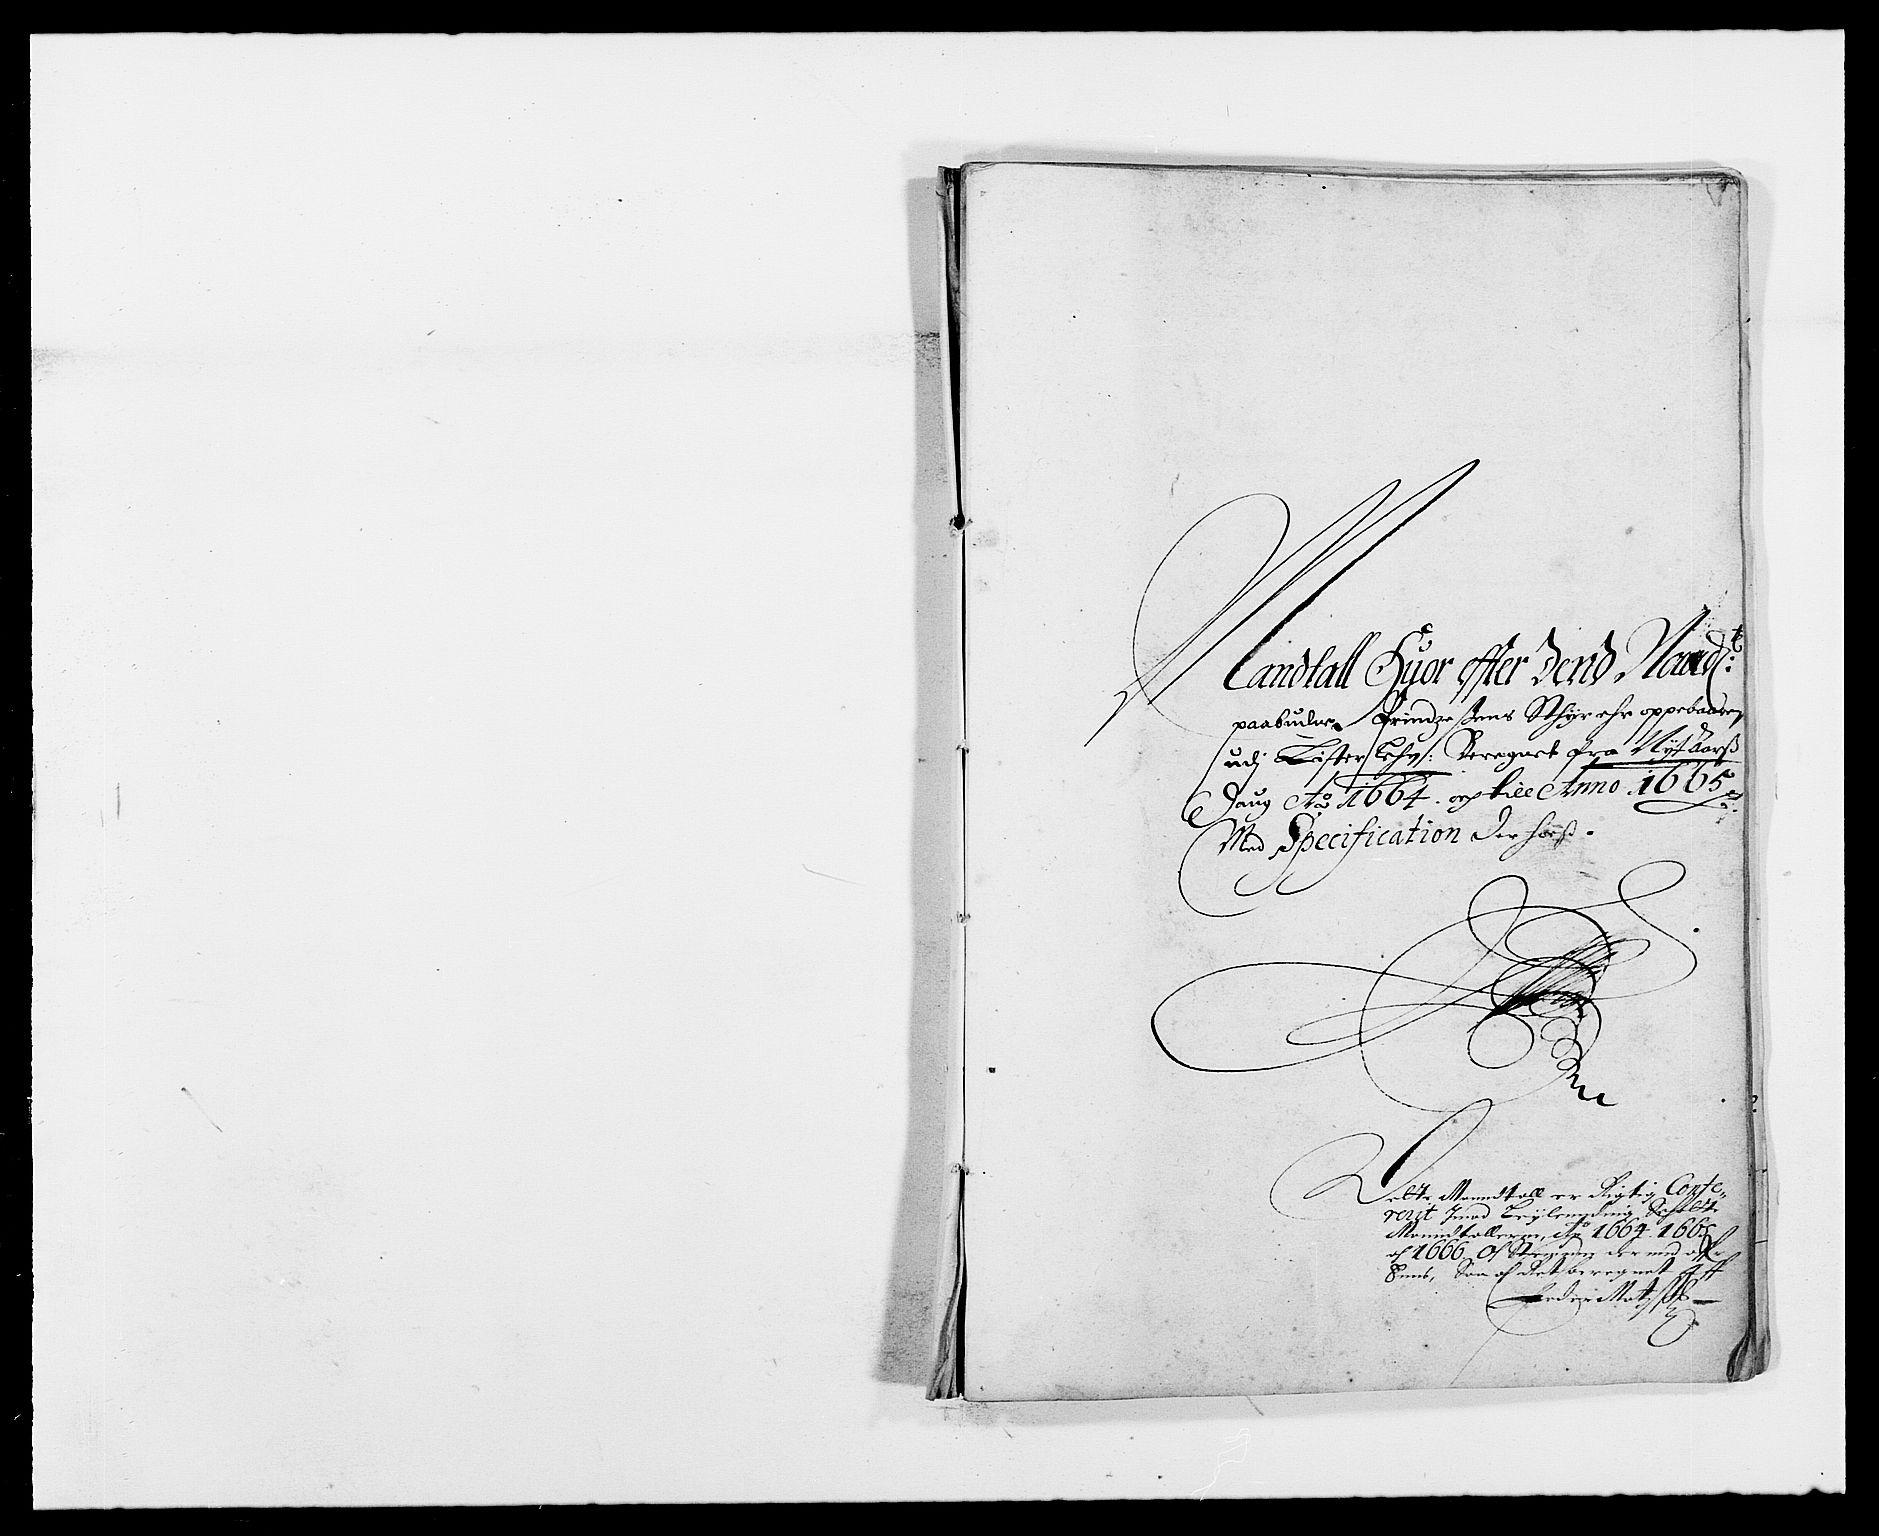 RA, Rentekammeret inntil 1814, Reviderte regnskaper, Fogderegnskap, R41/L2523: Fogderegnskap Lista, 1663-1664, s. 375